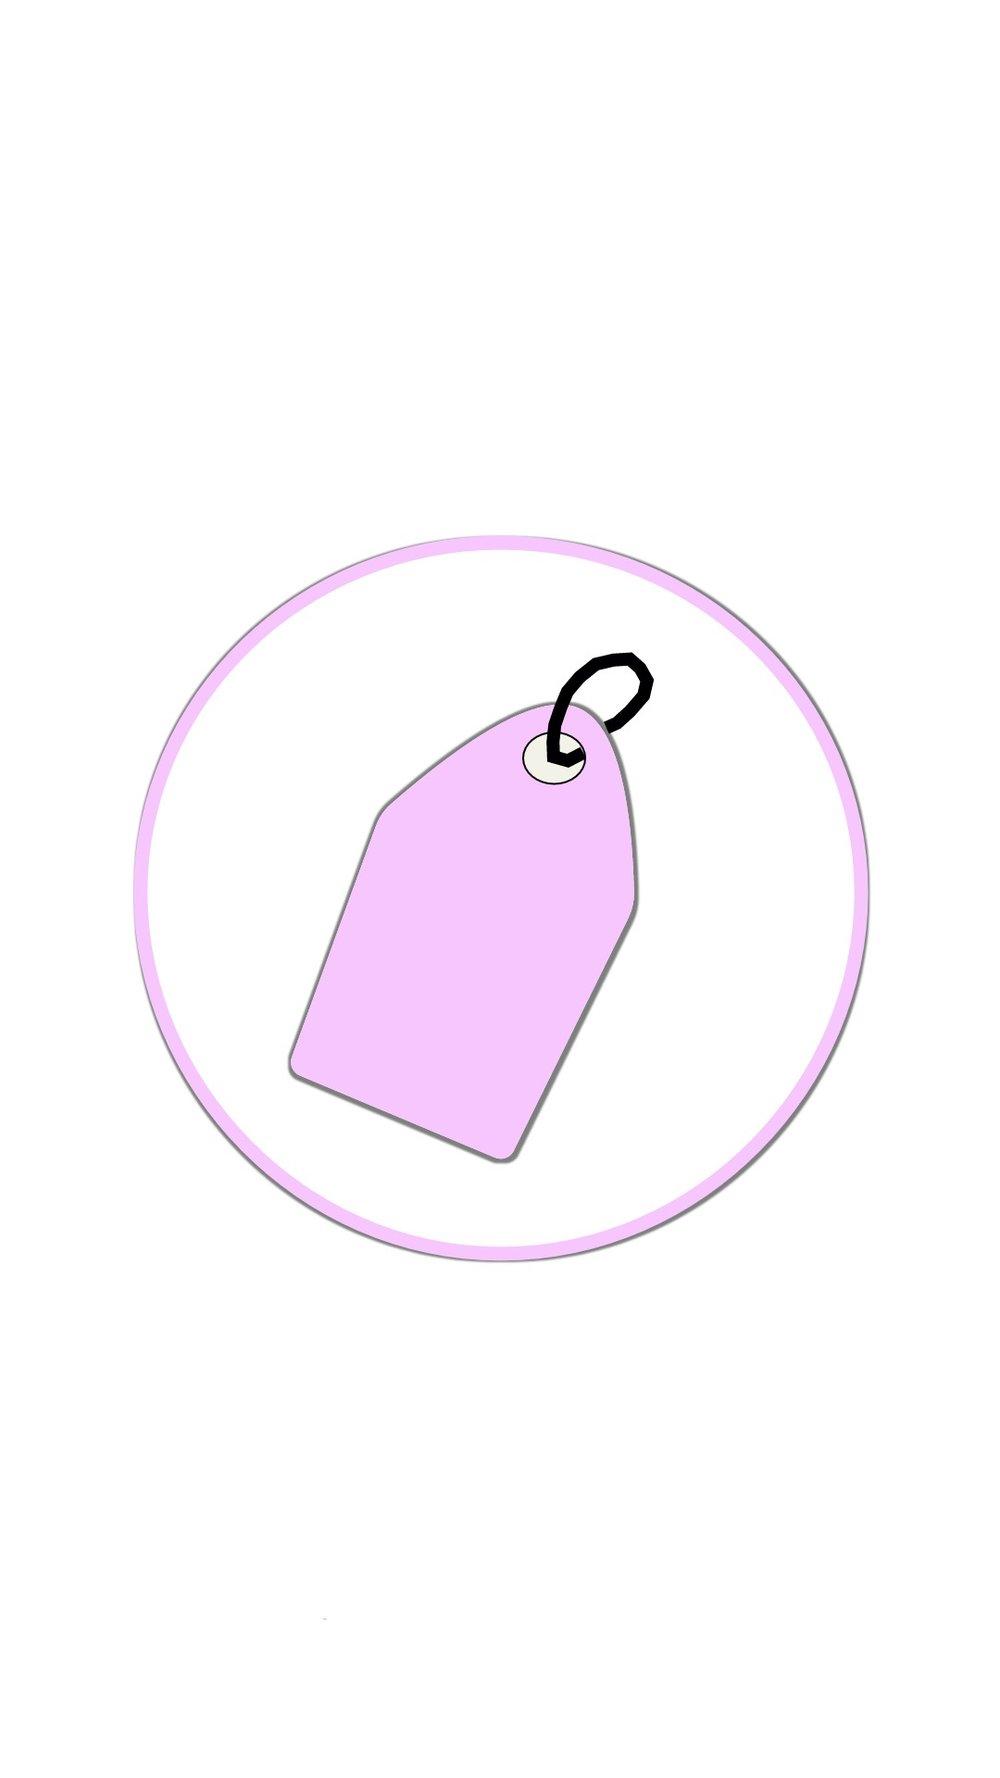 Instagram-cover-tag-pinkwhite-lotnotes.com.jpg